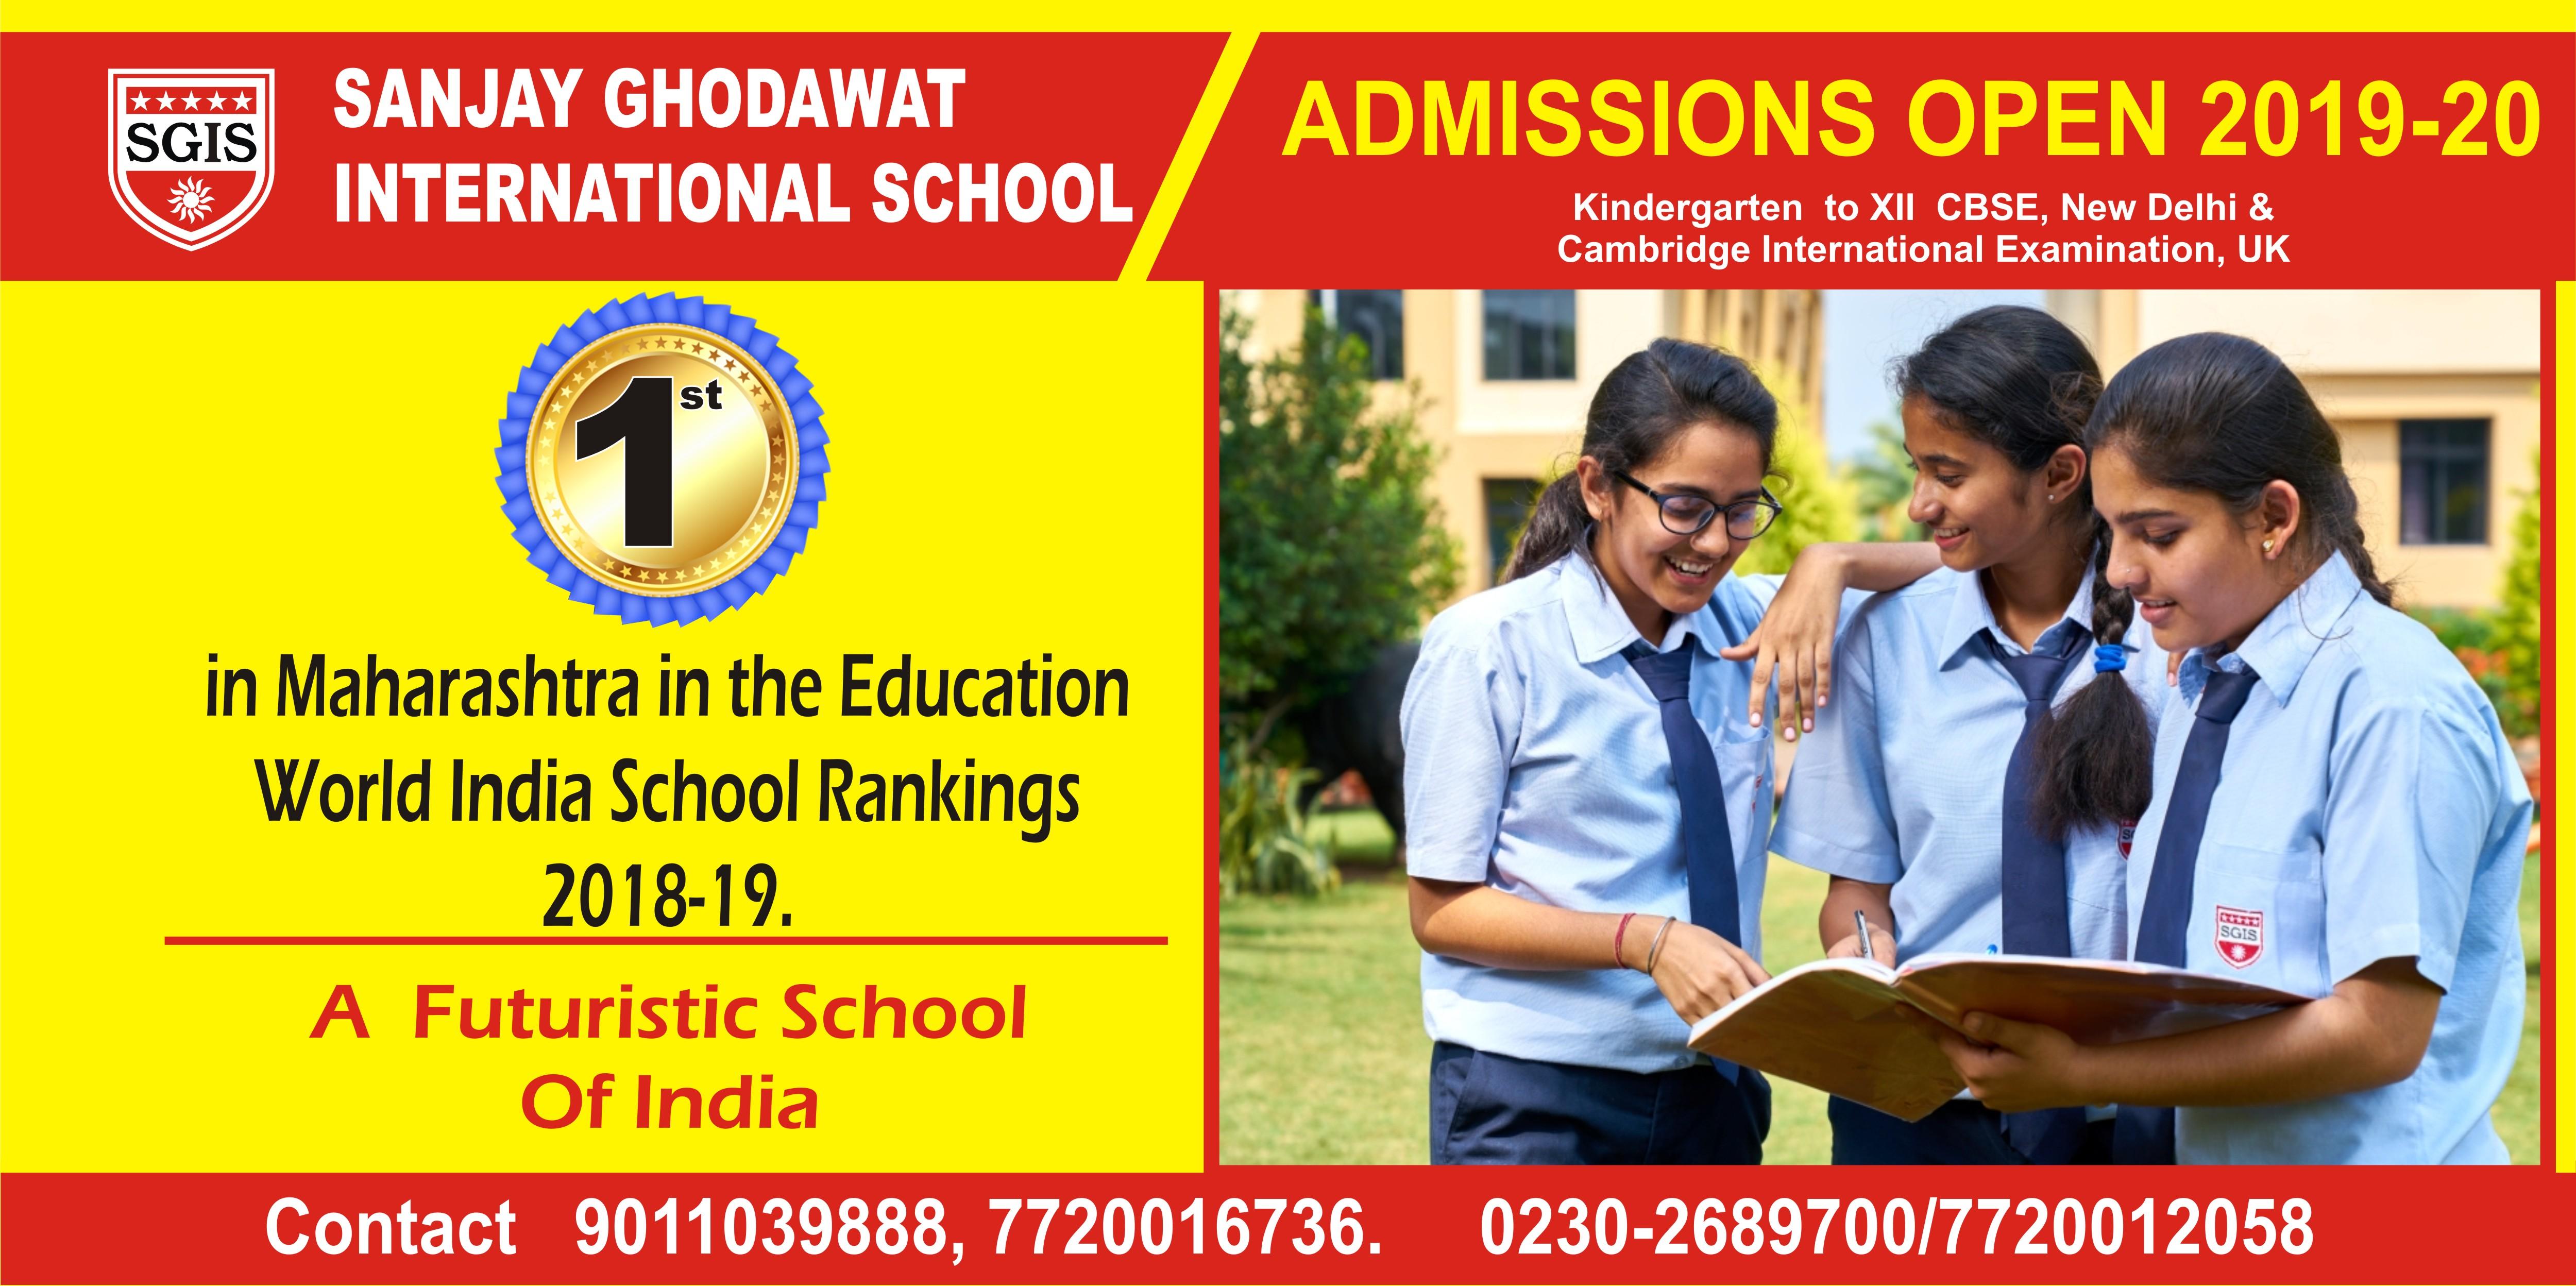 Welcome : Sanjay Ghodawat International School